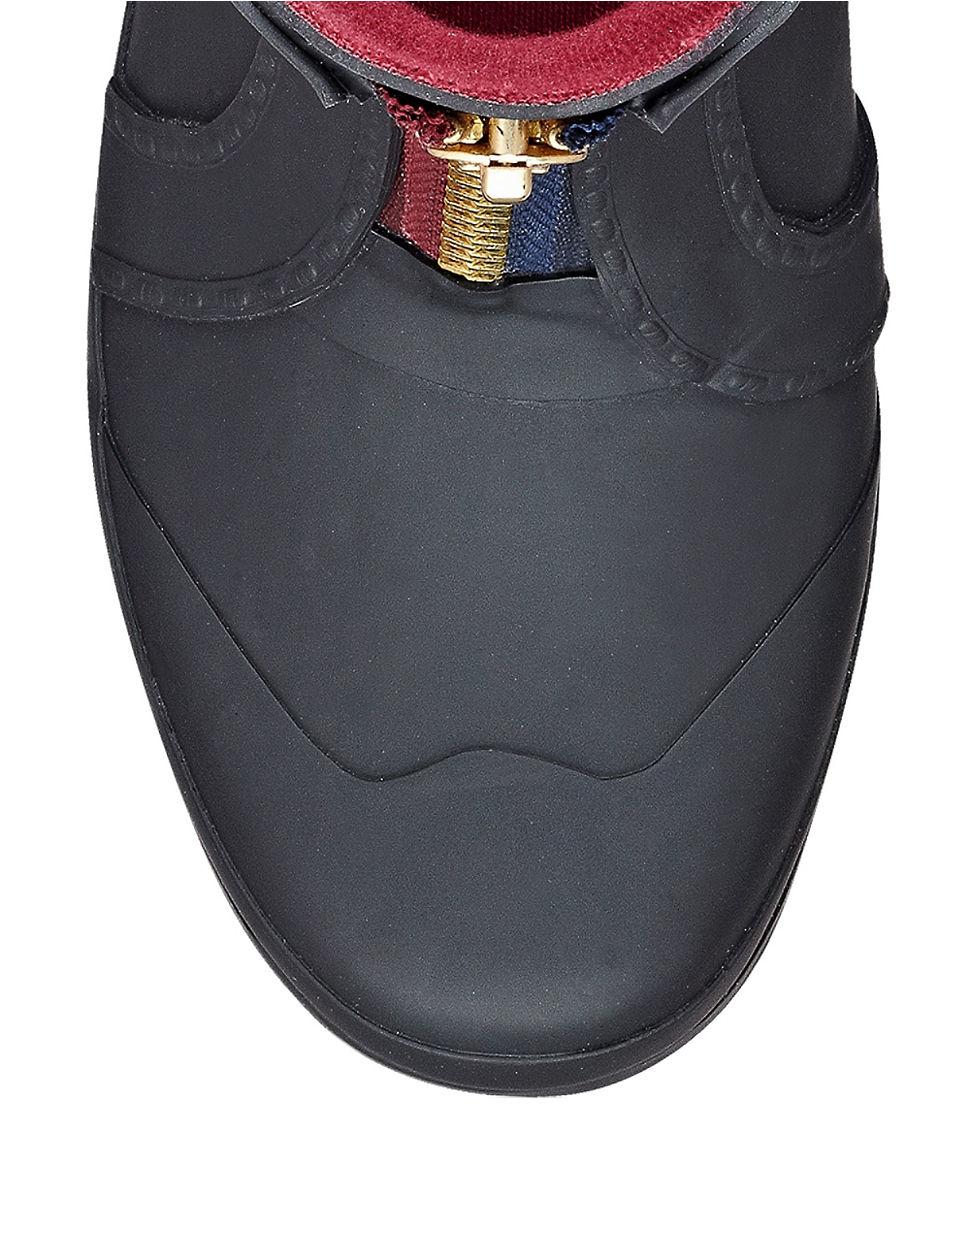 Tommy Hilfiger Rubber Ryann Zip-Up Rain Boot In Black - Lyst-9846